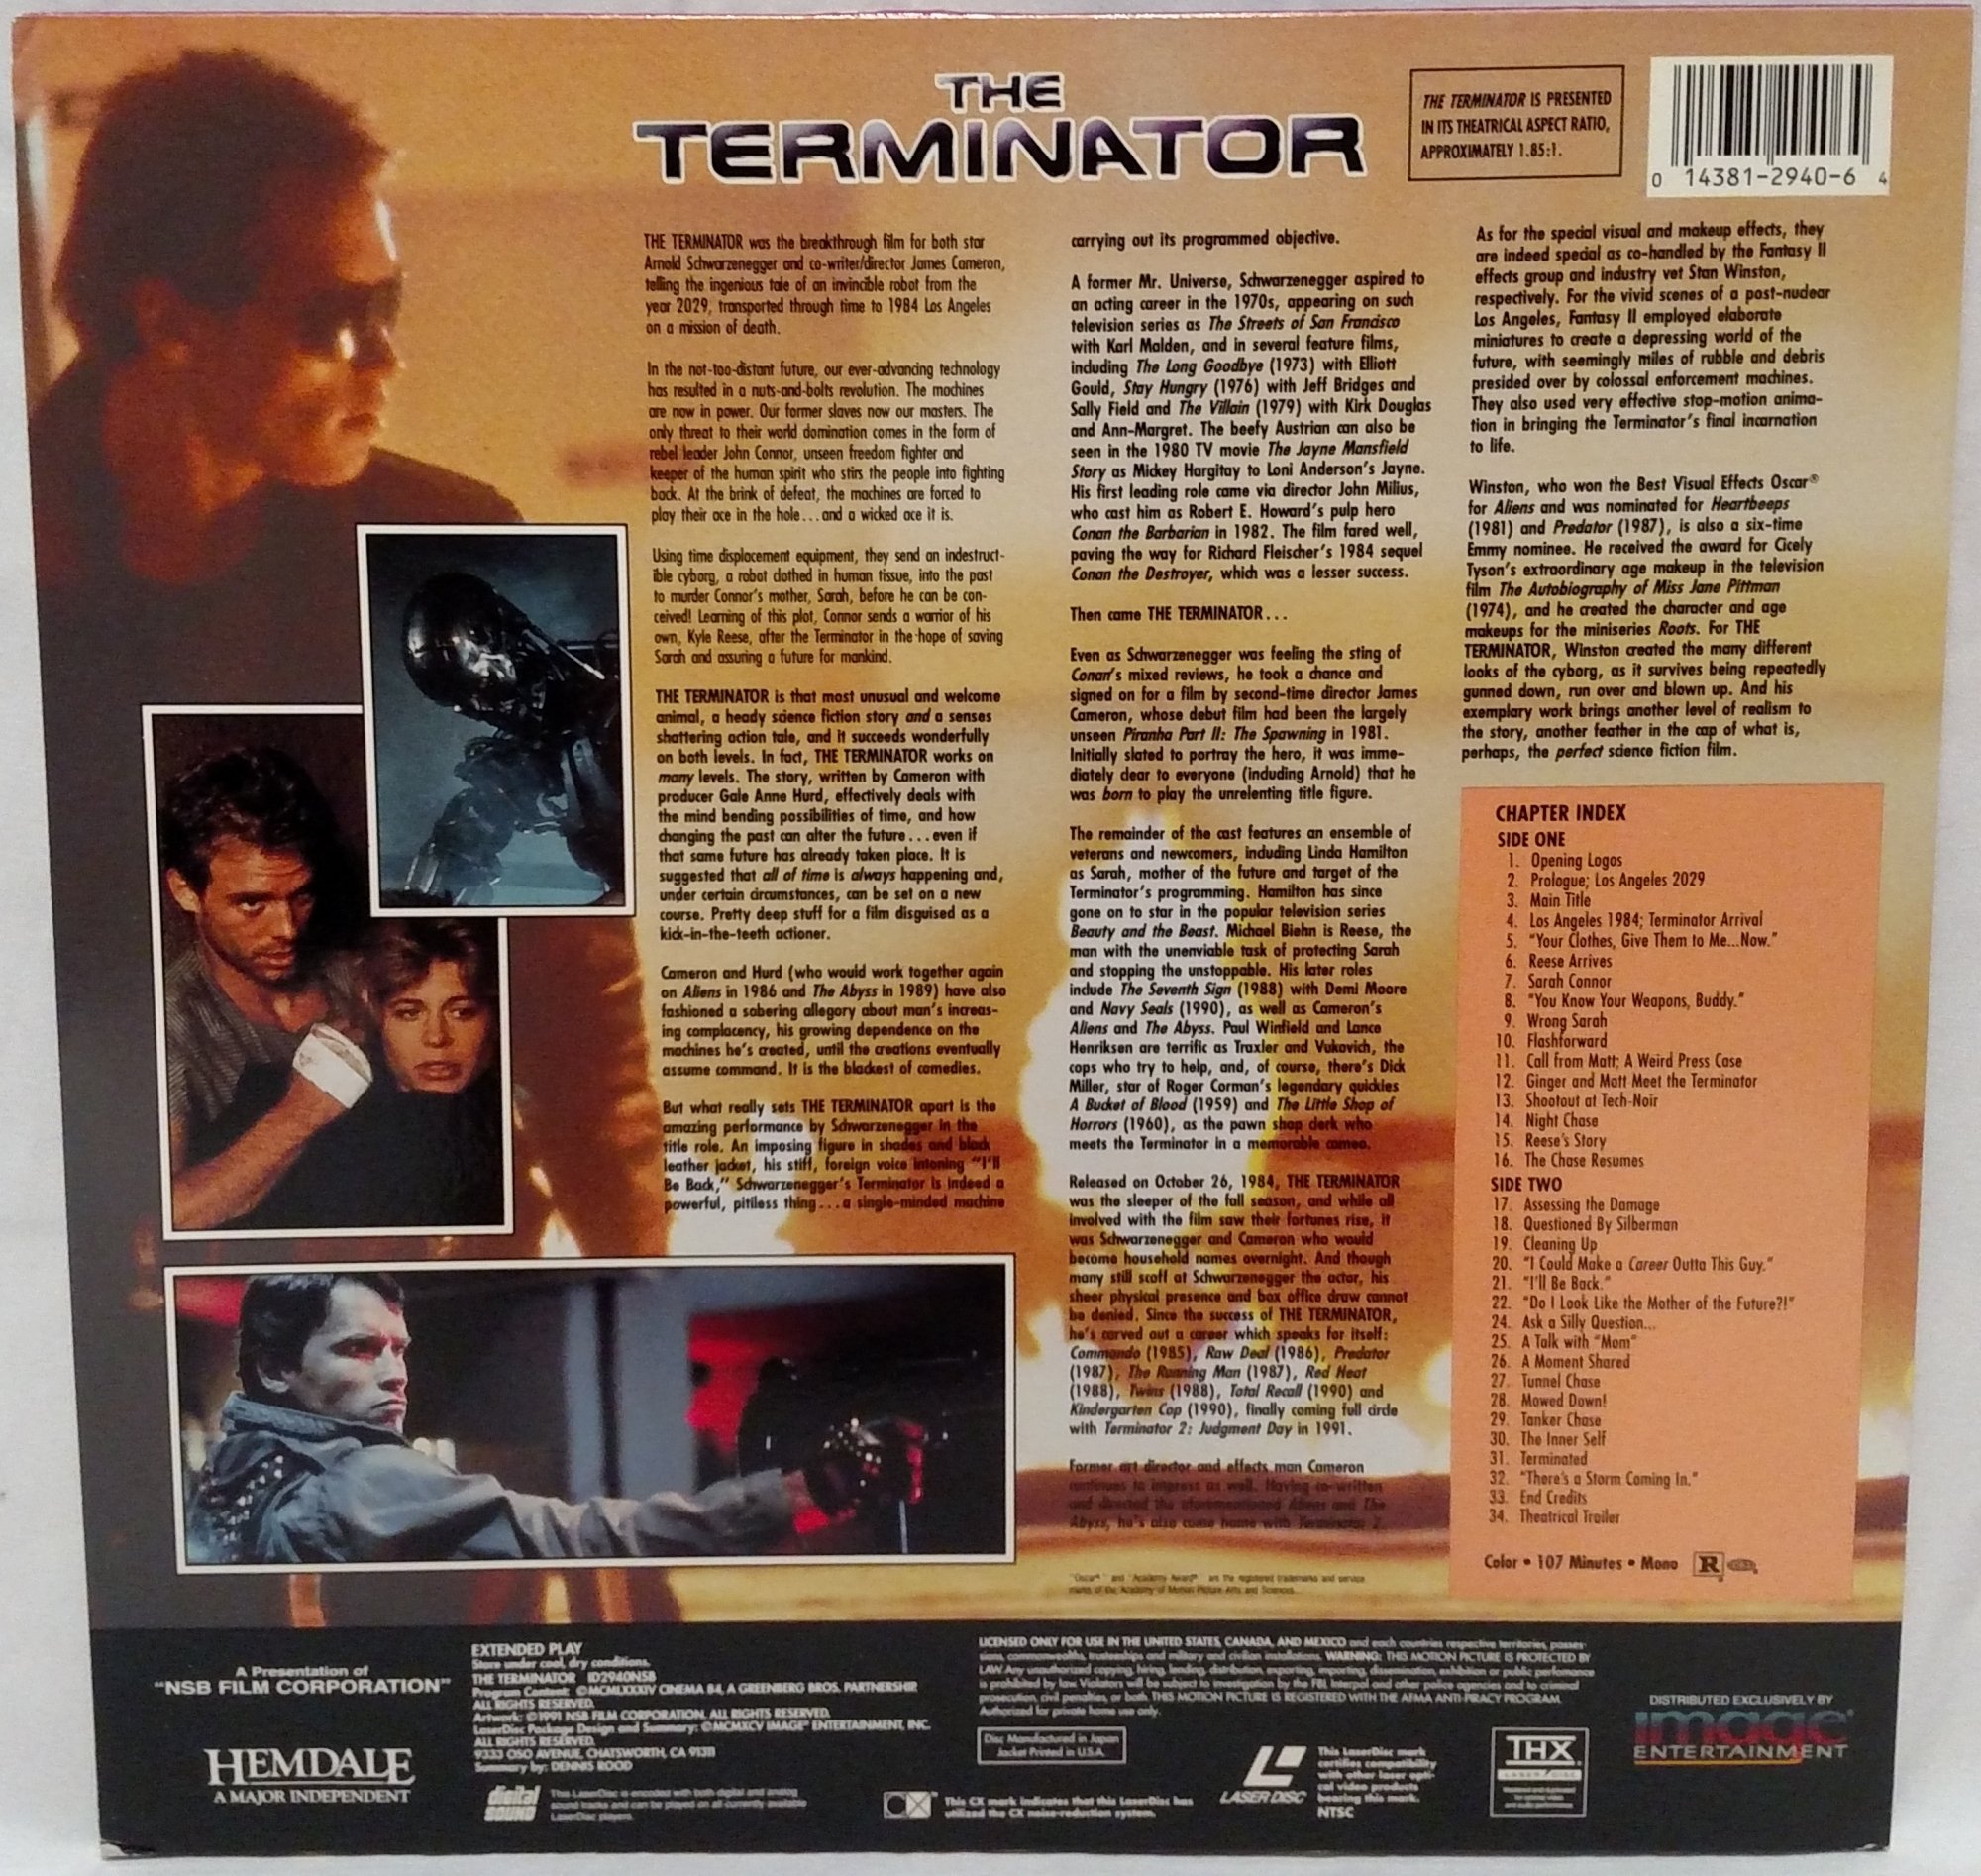 The Terminator Laserdisc back cover